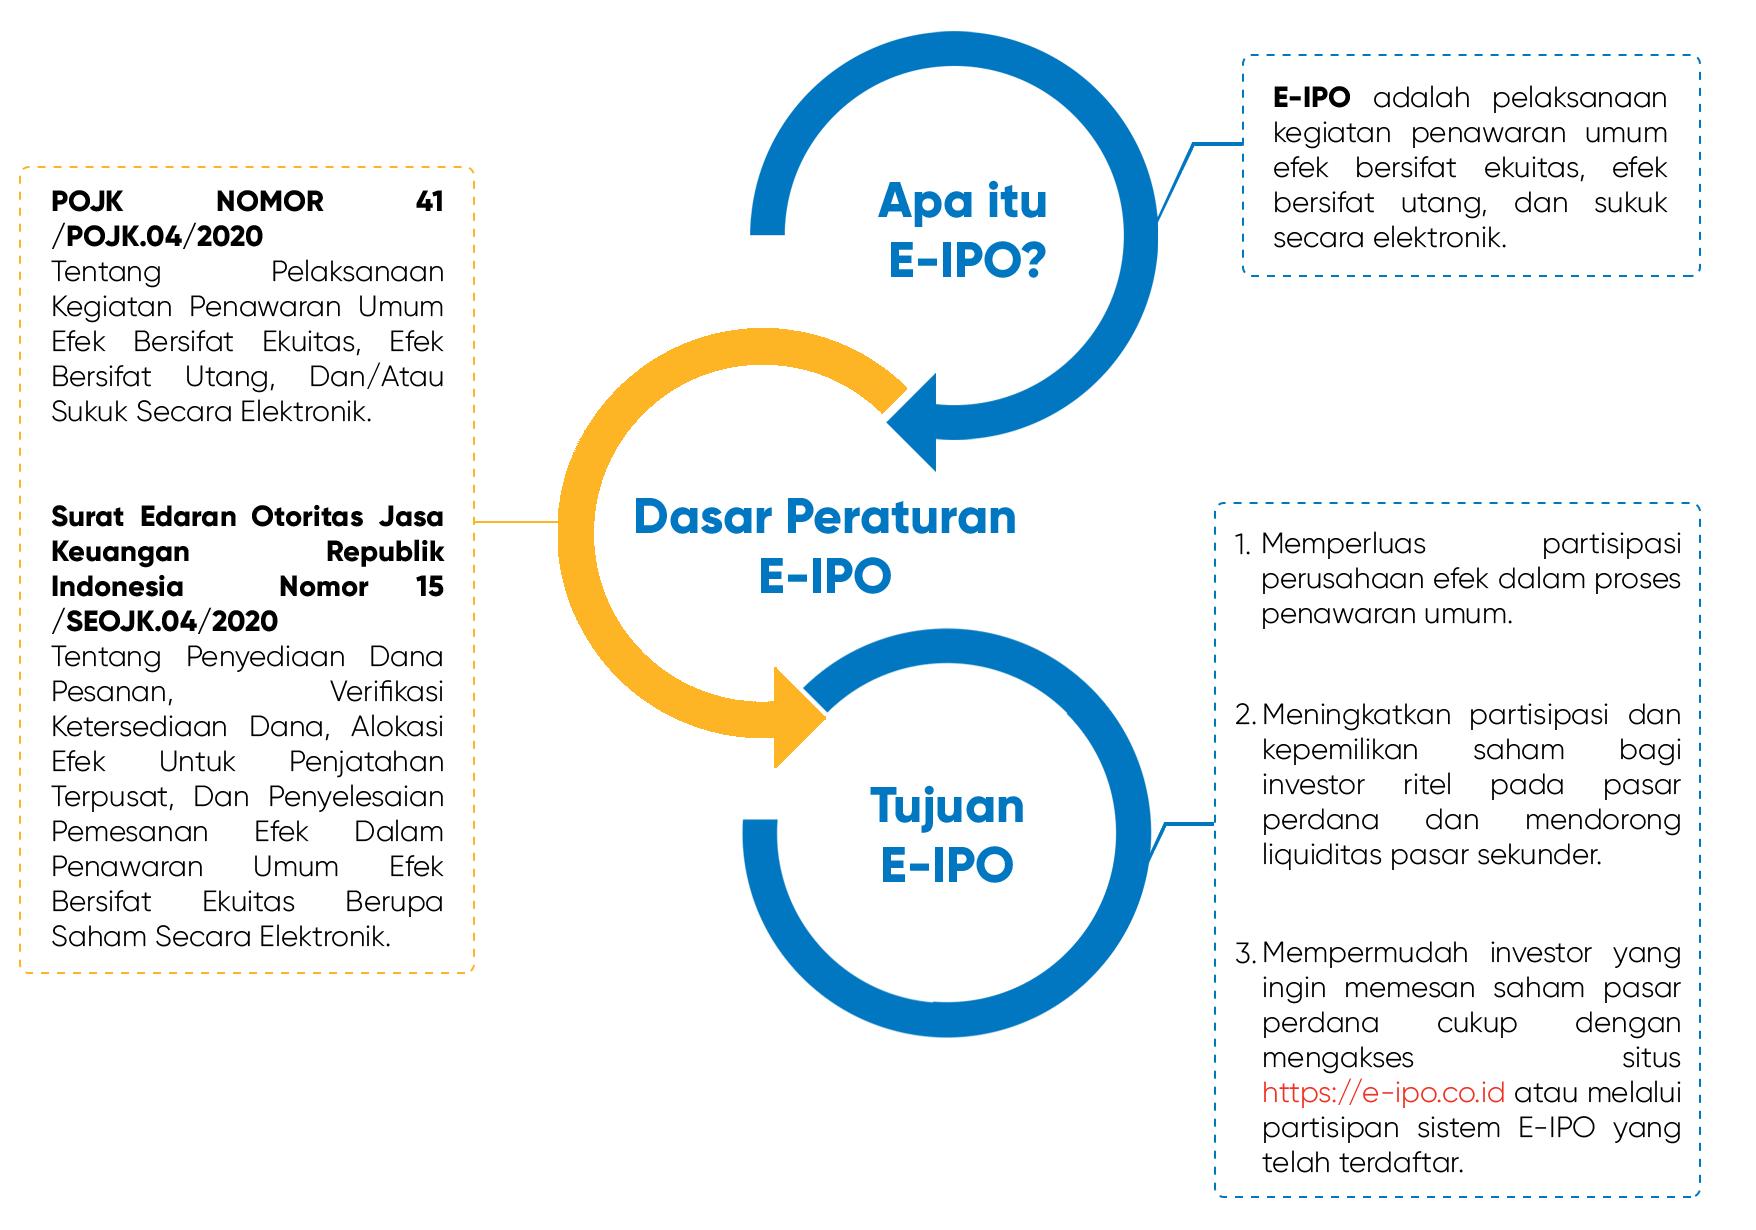 Langkah Mengikuti E-IPO